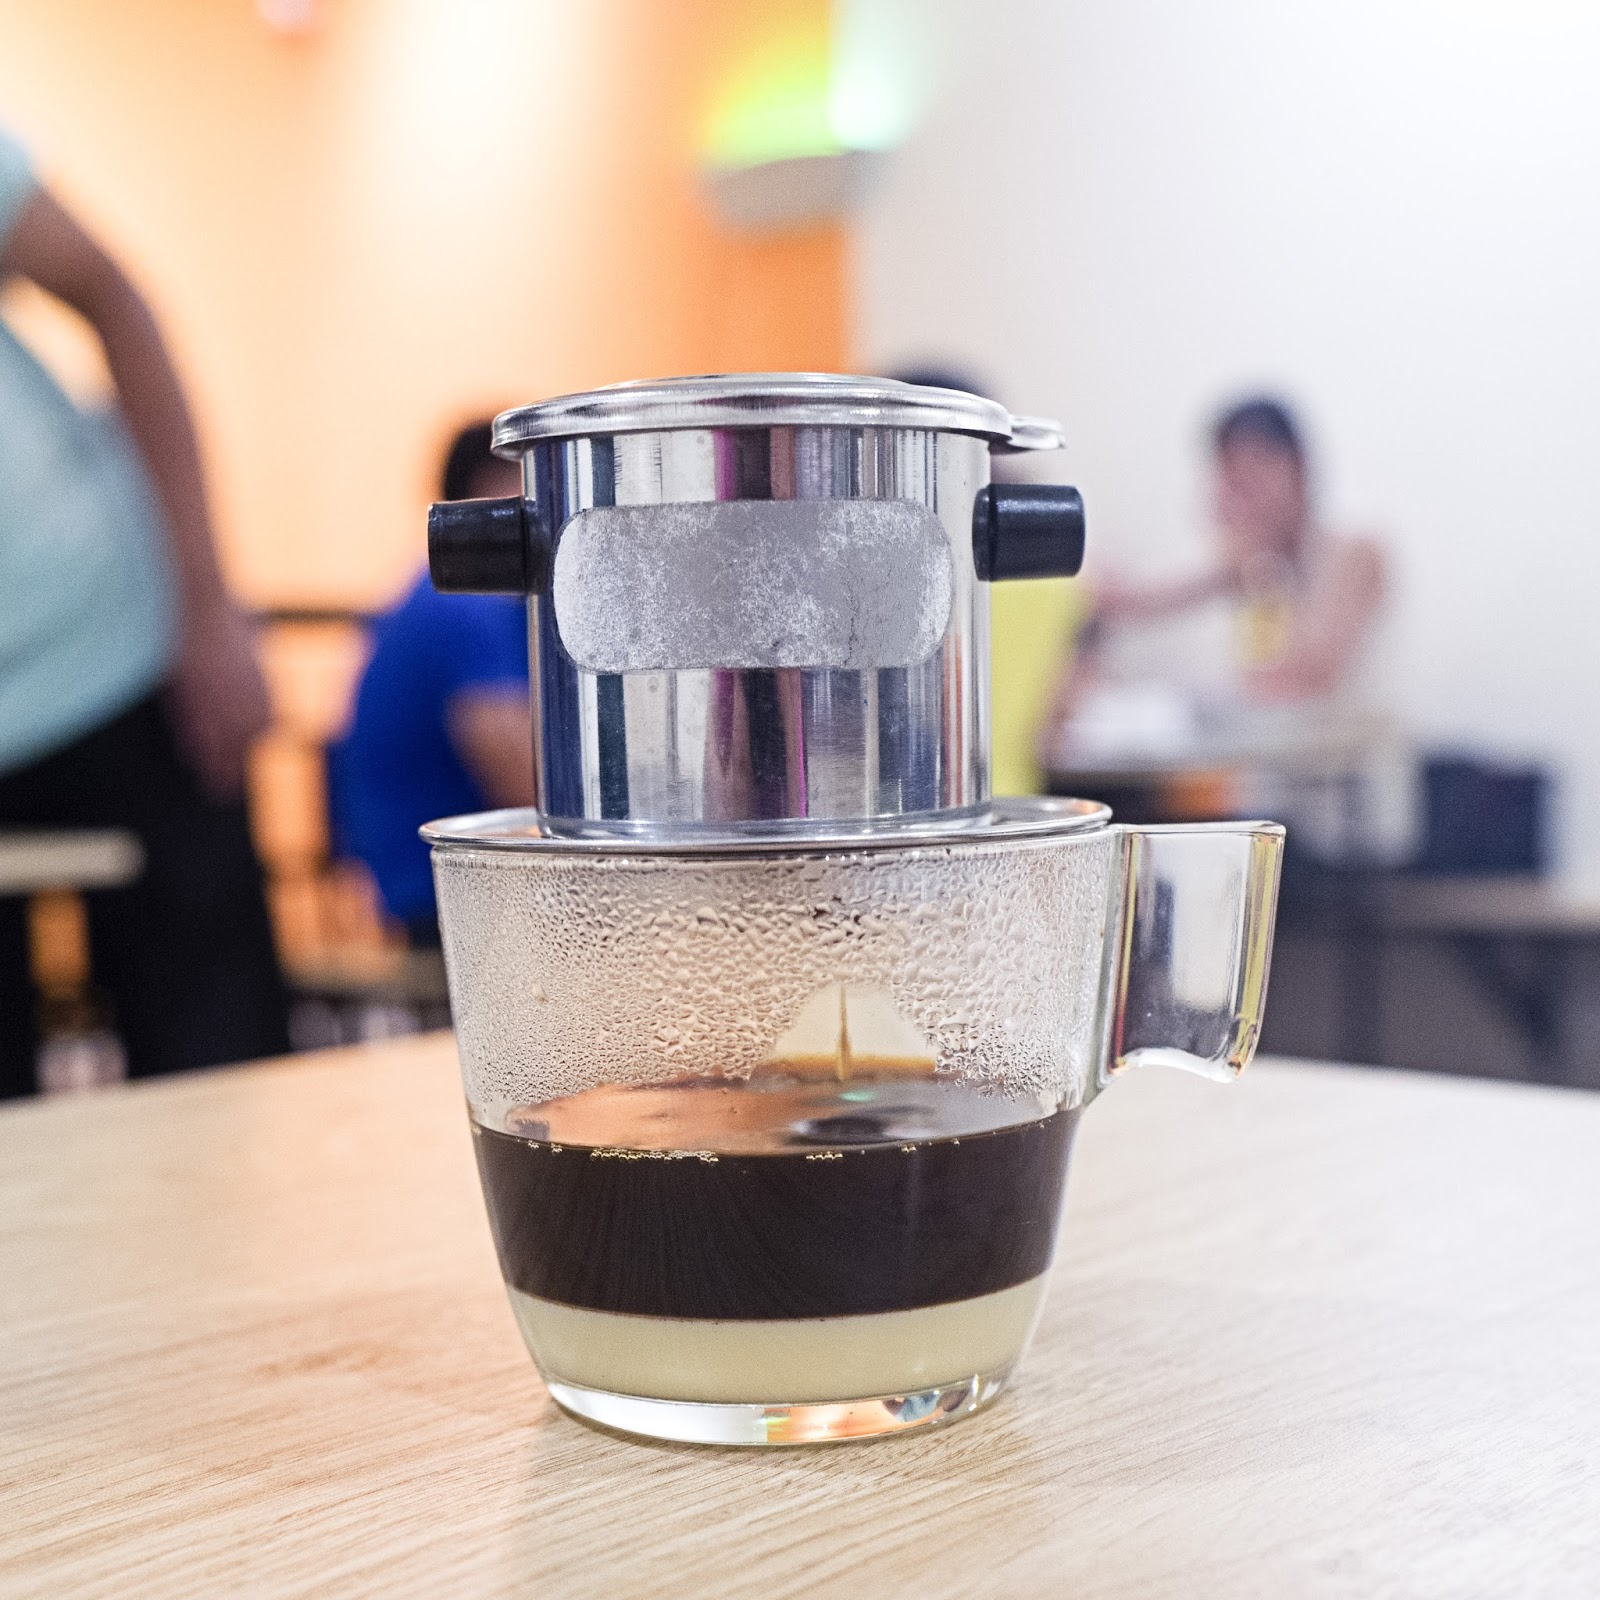 d-coffee-L1070116.jpg